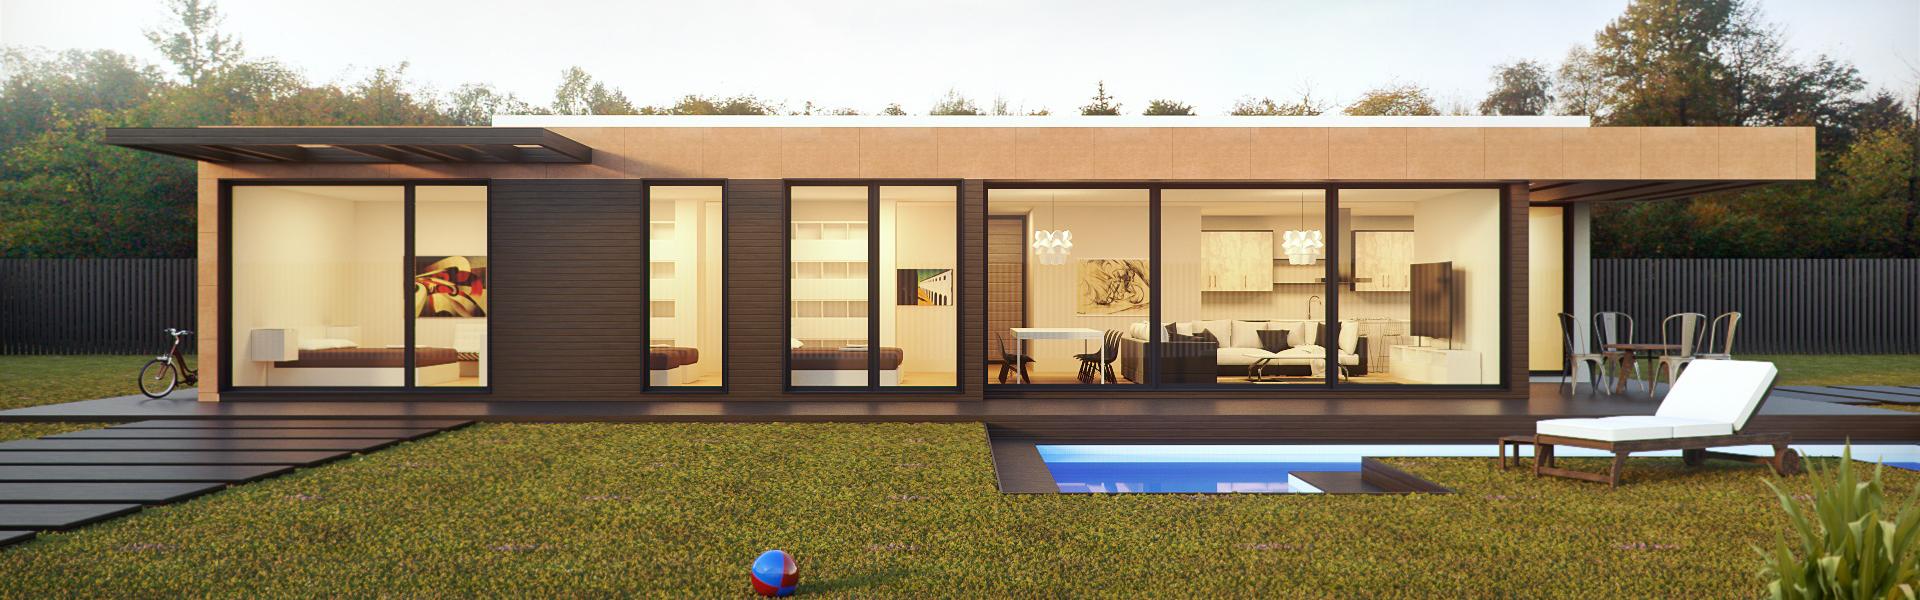 real estate jmg. inmobiliaria valencia